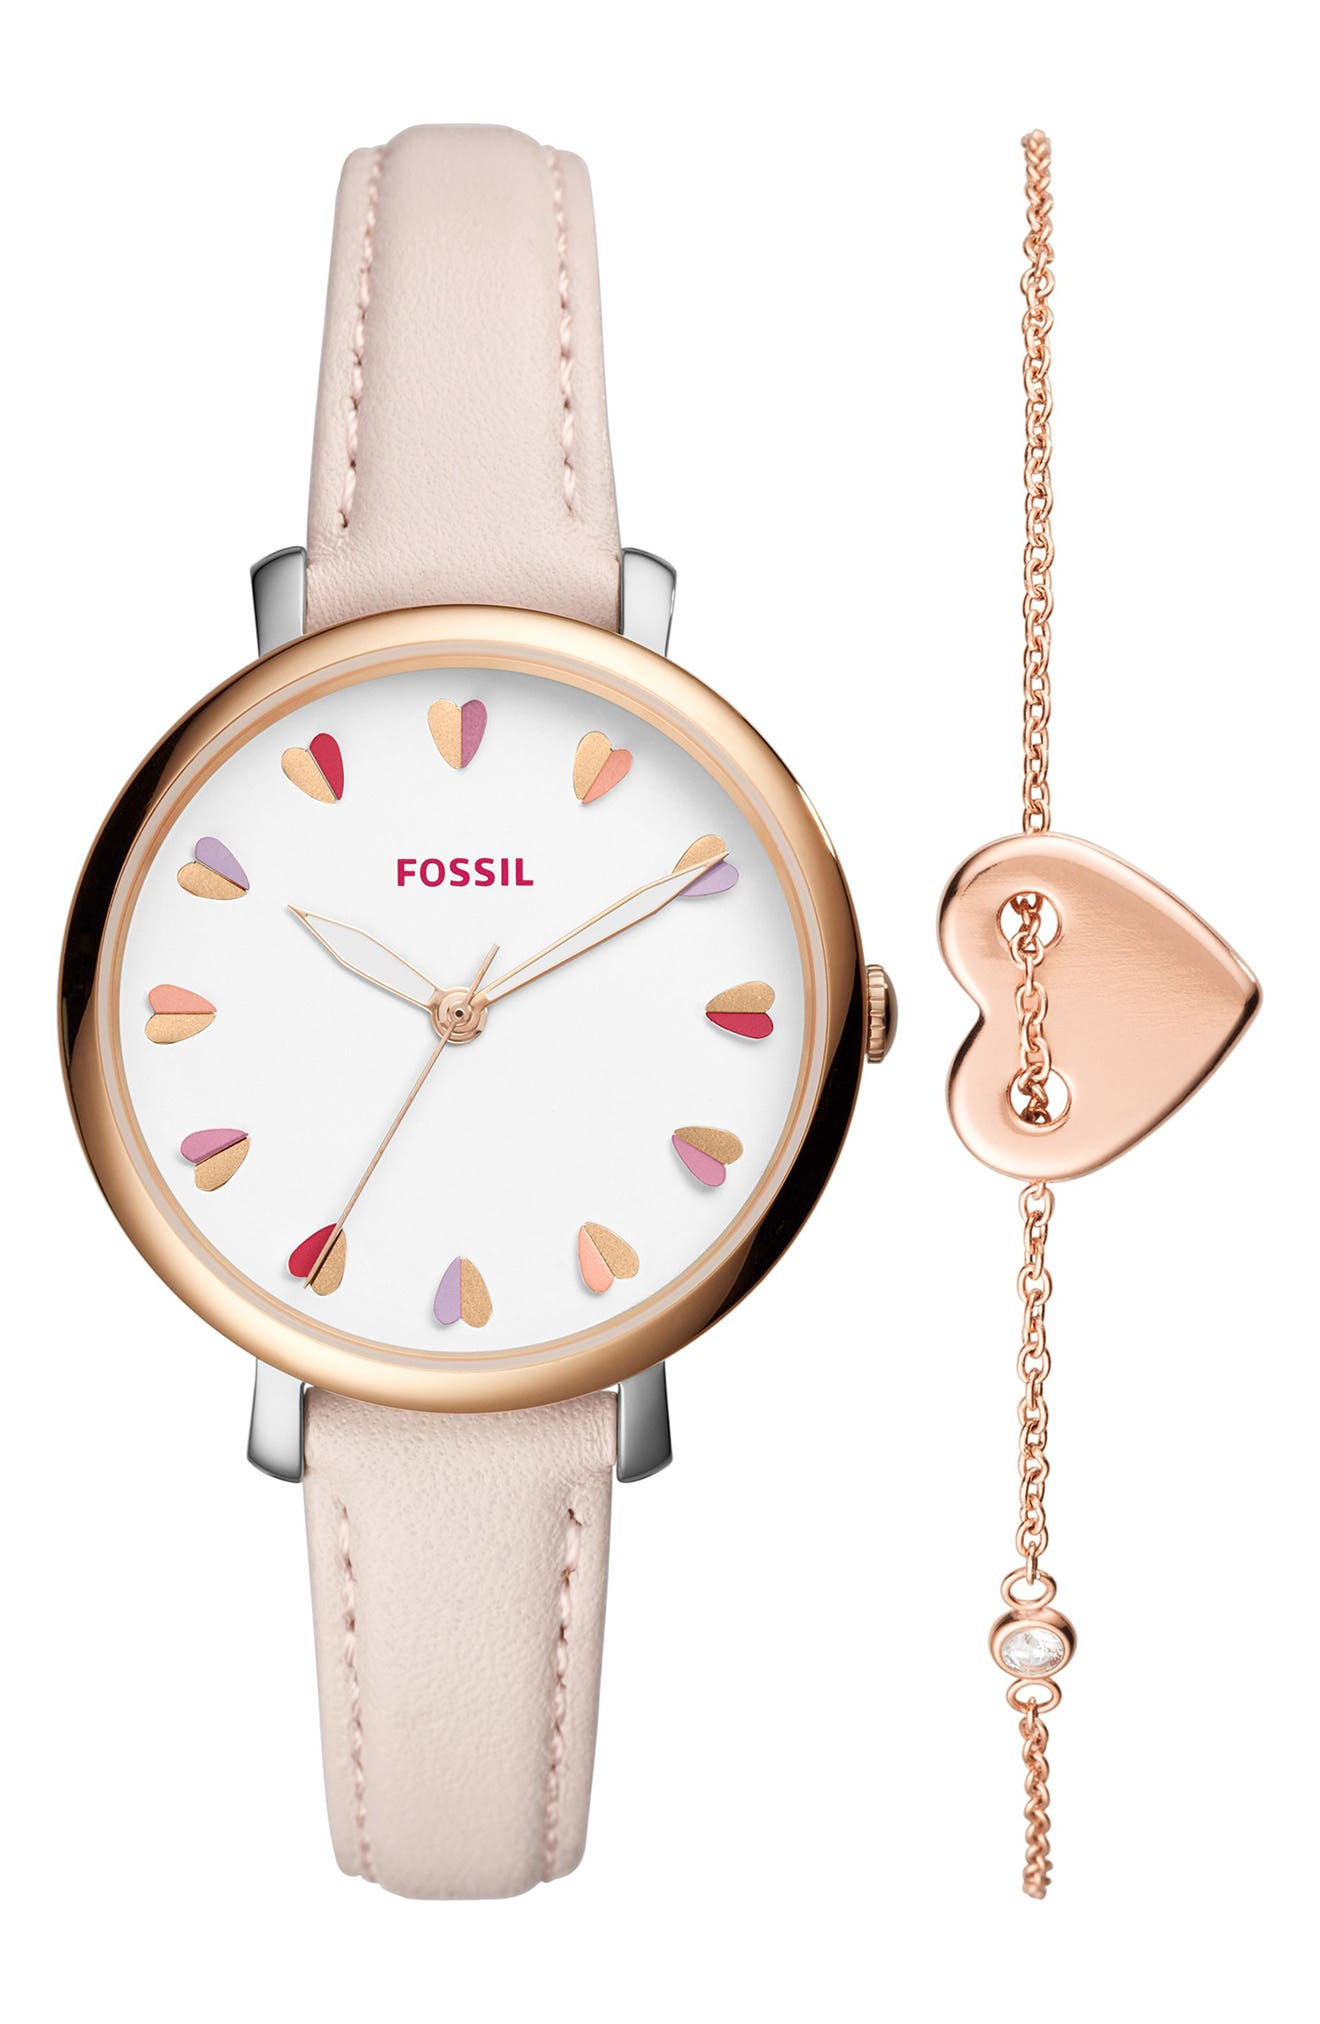 Main Image - Fossil Jacqueline Leather Strap Watch & Bracelet Set, 36mm